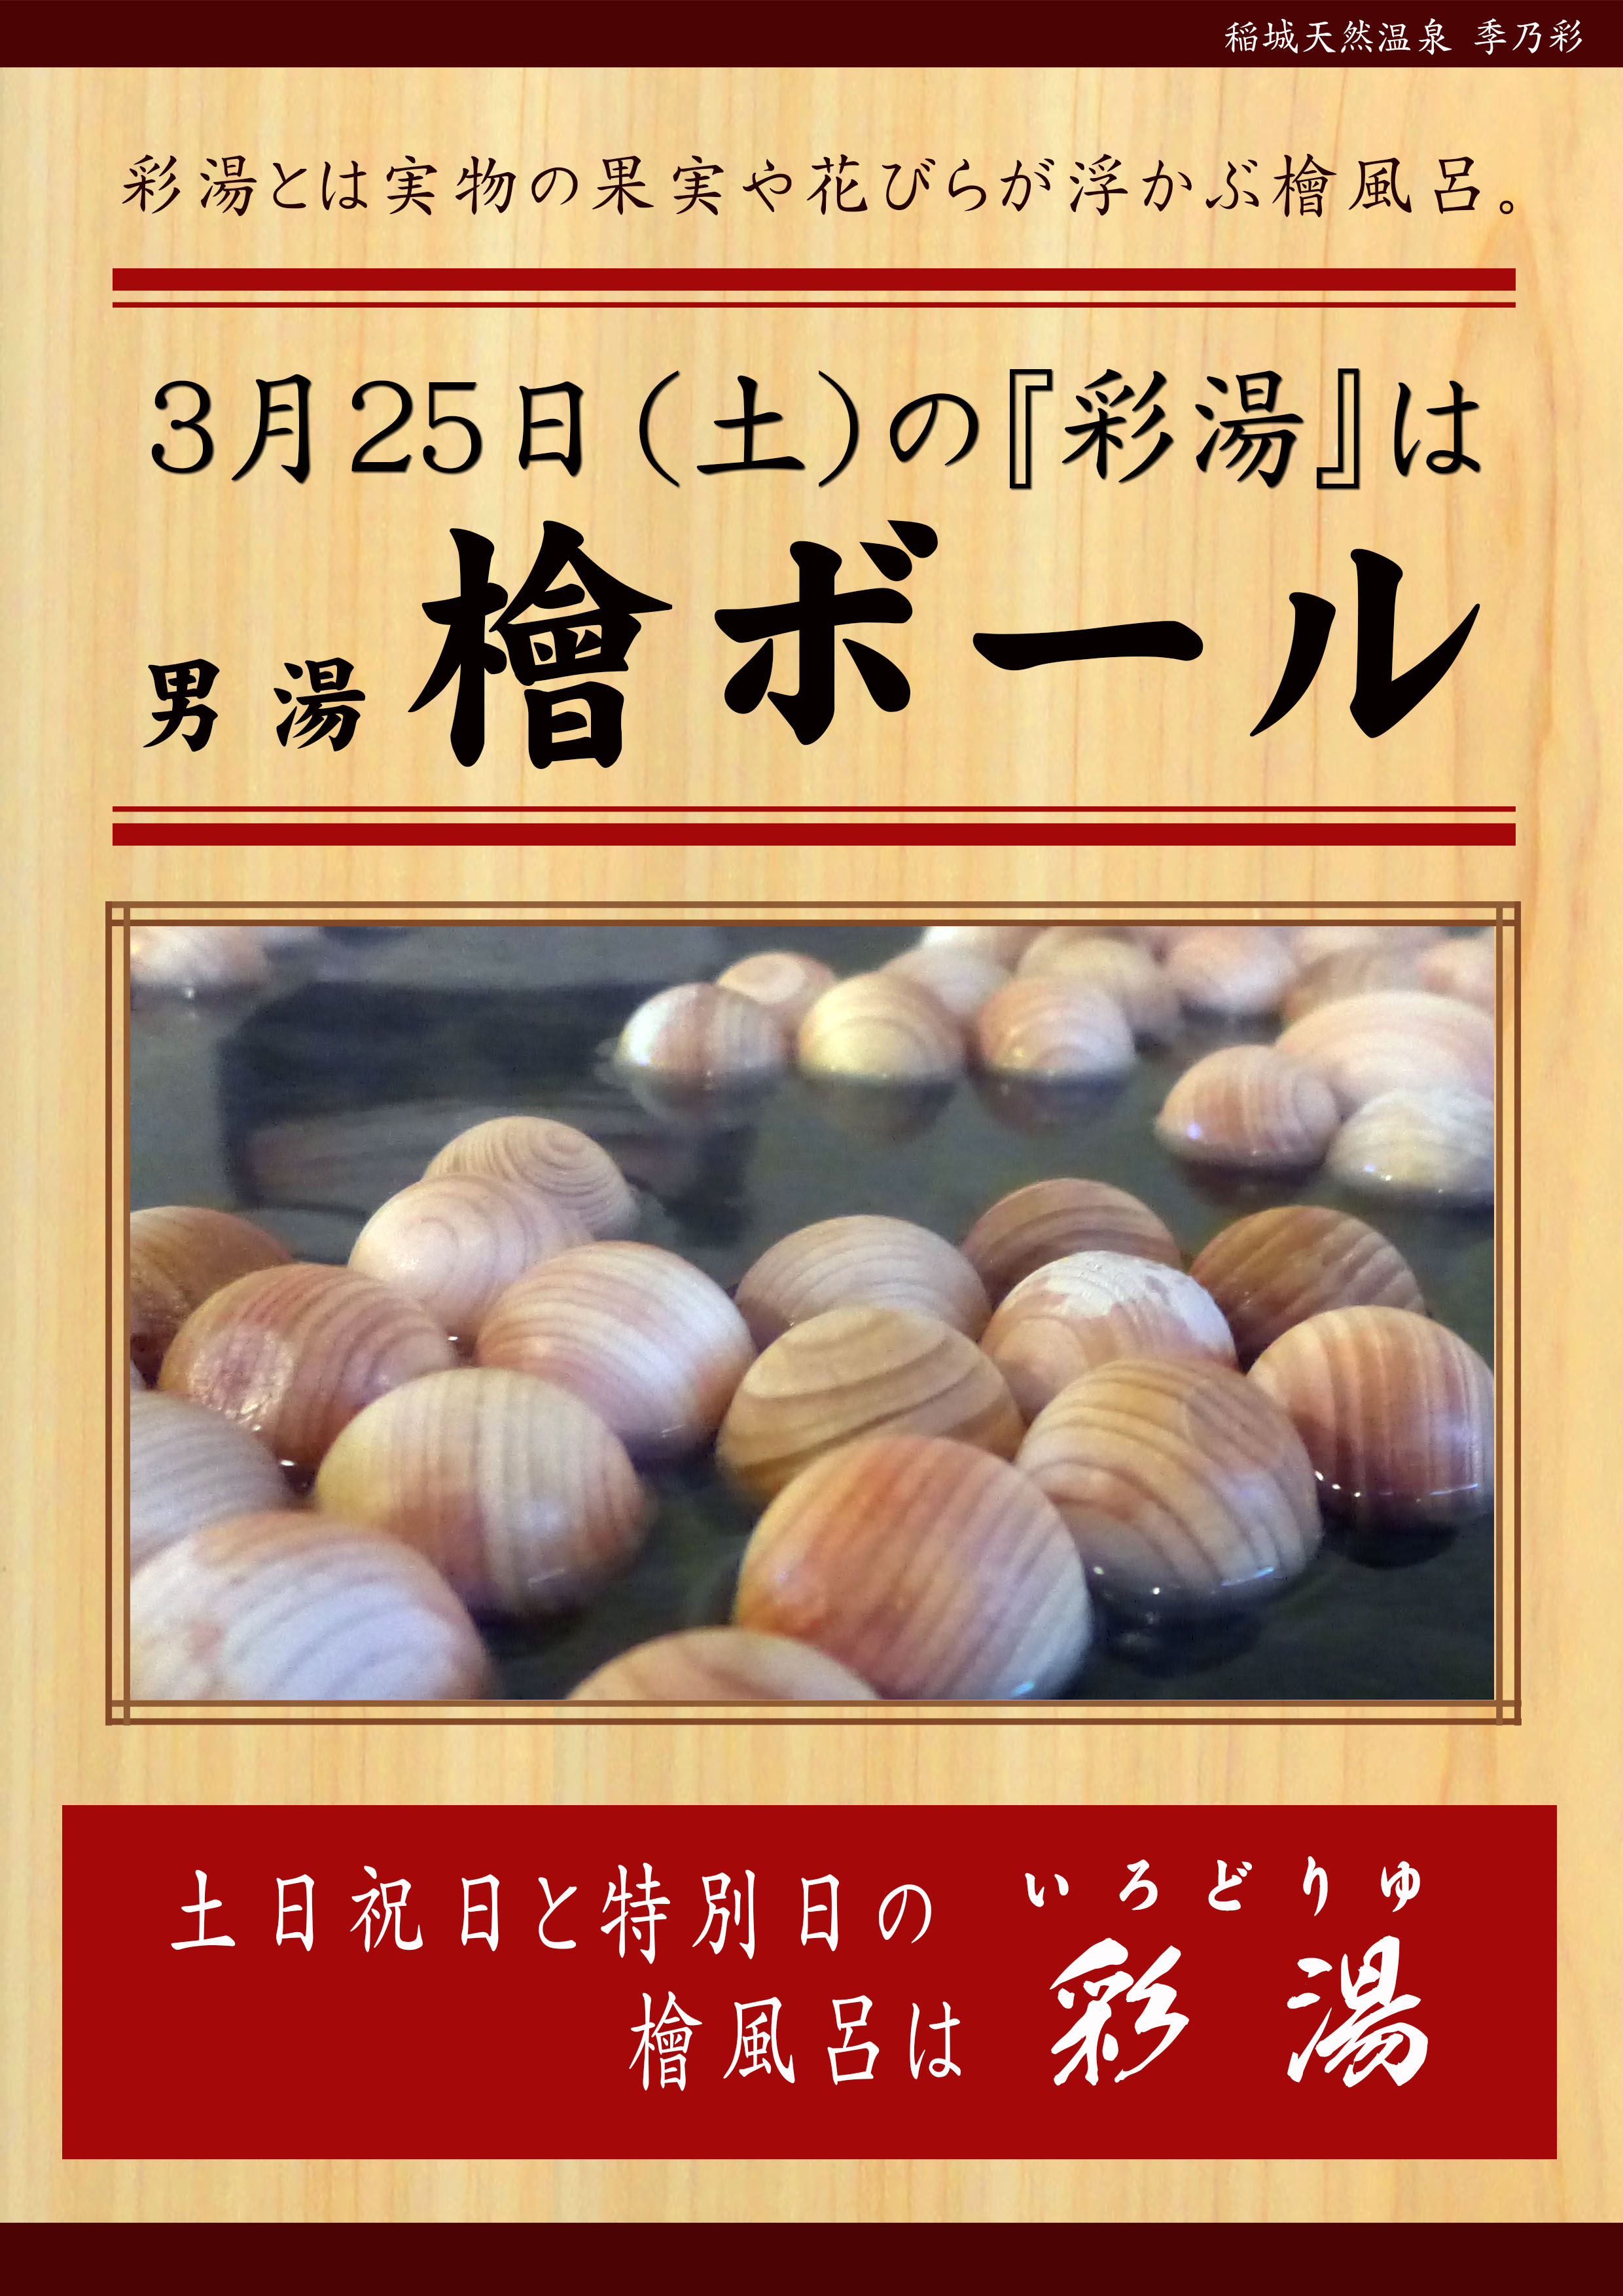 20170325POP イベント 彩湯 男湯 檜ボール